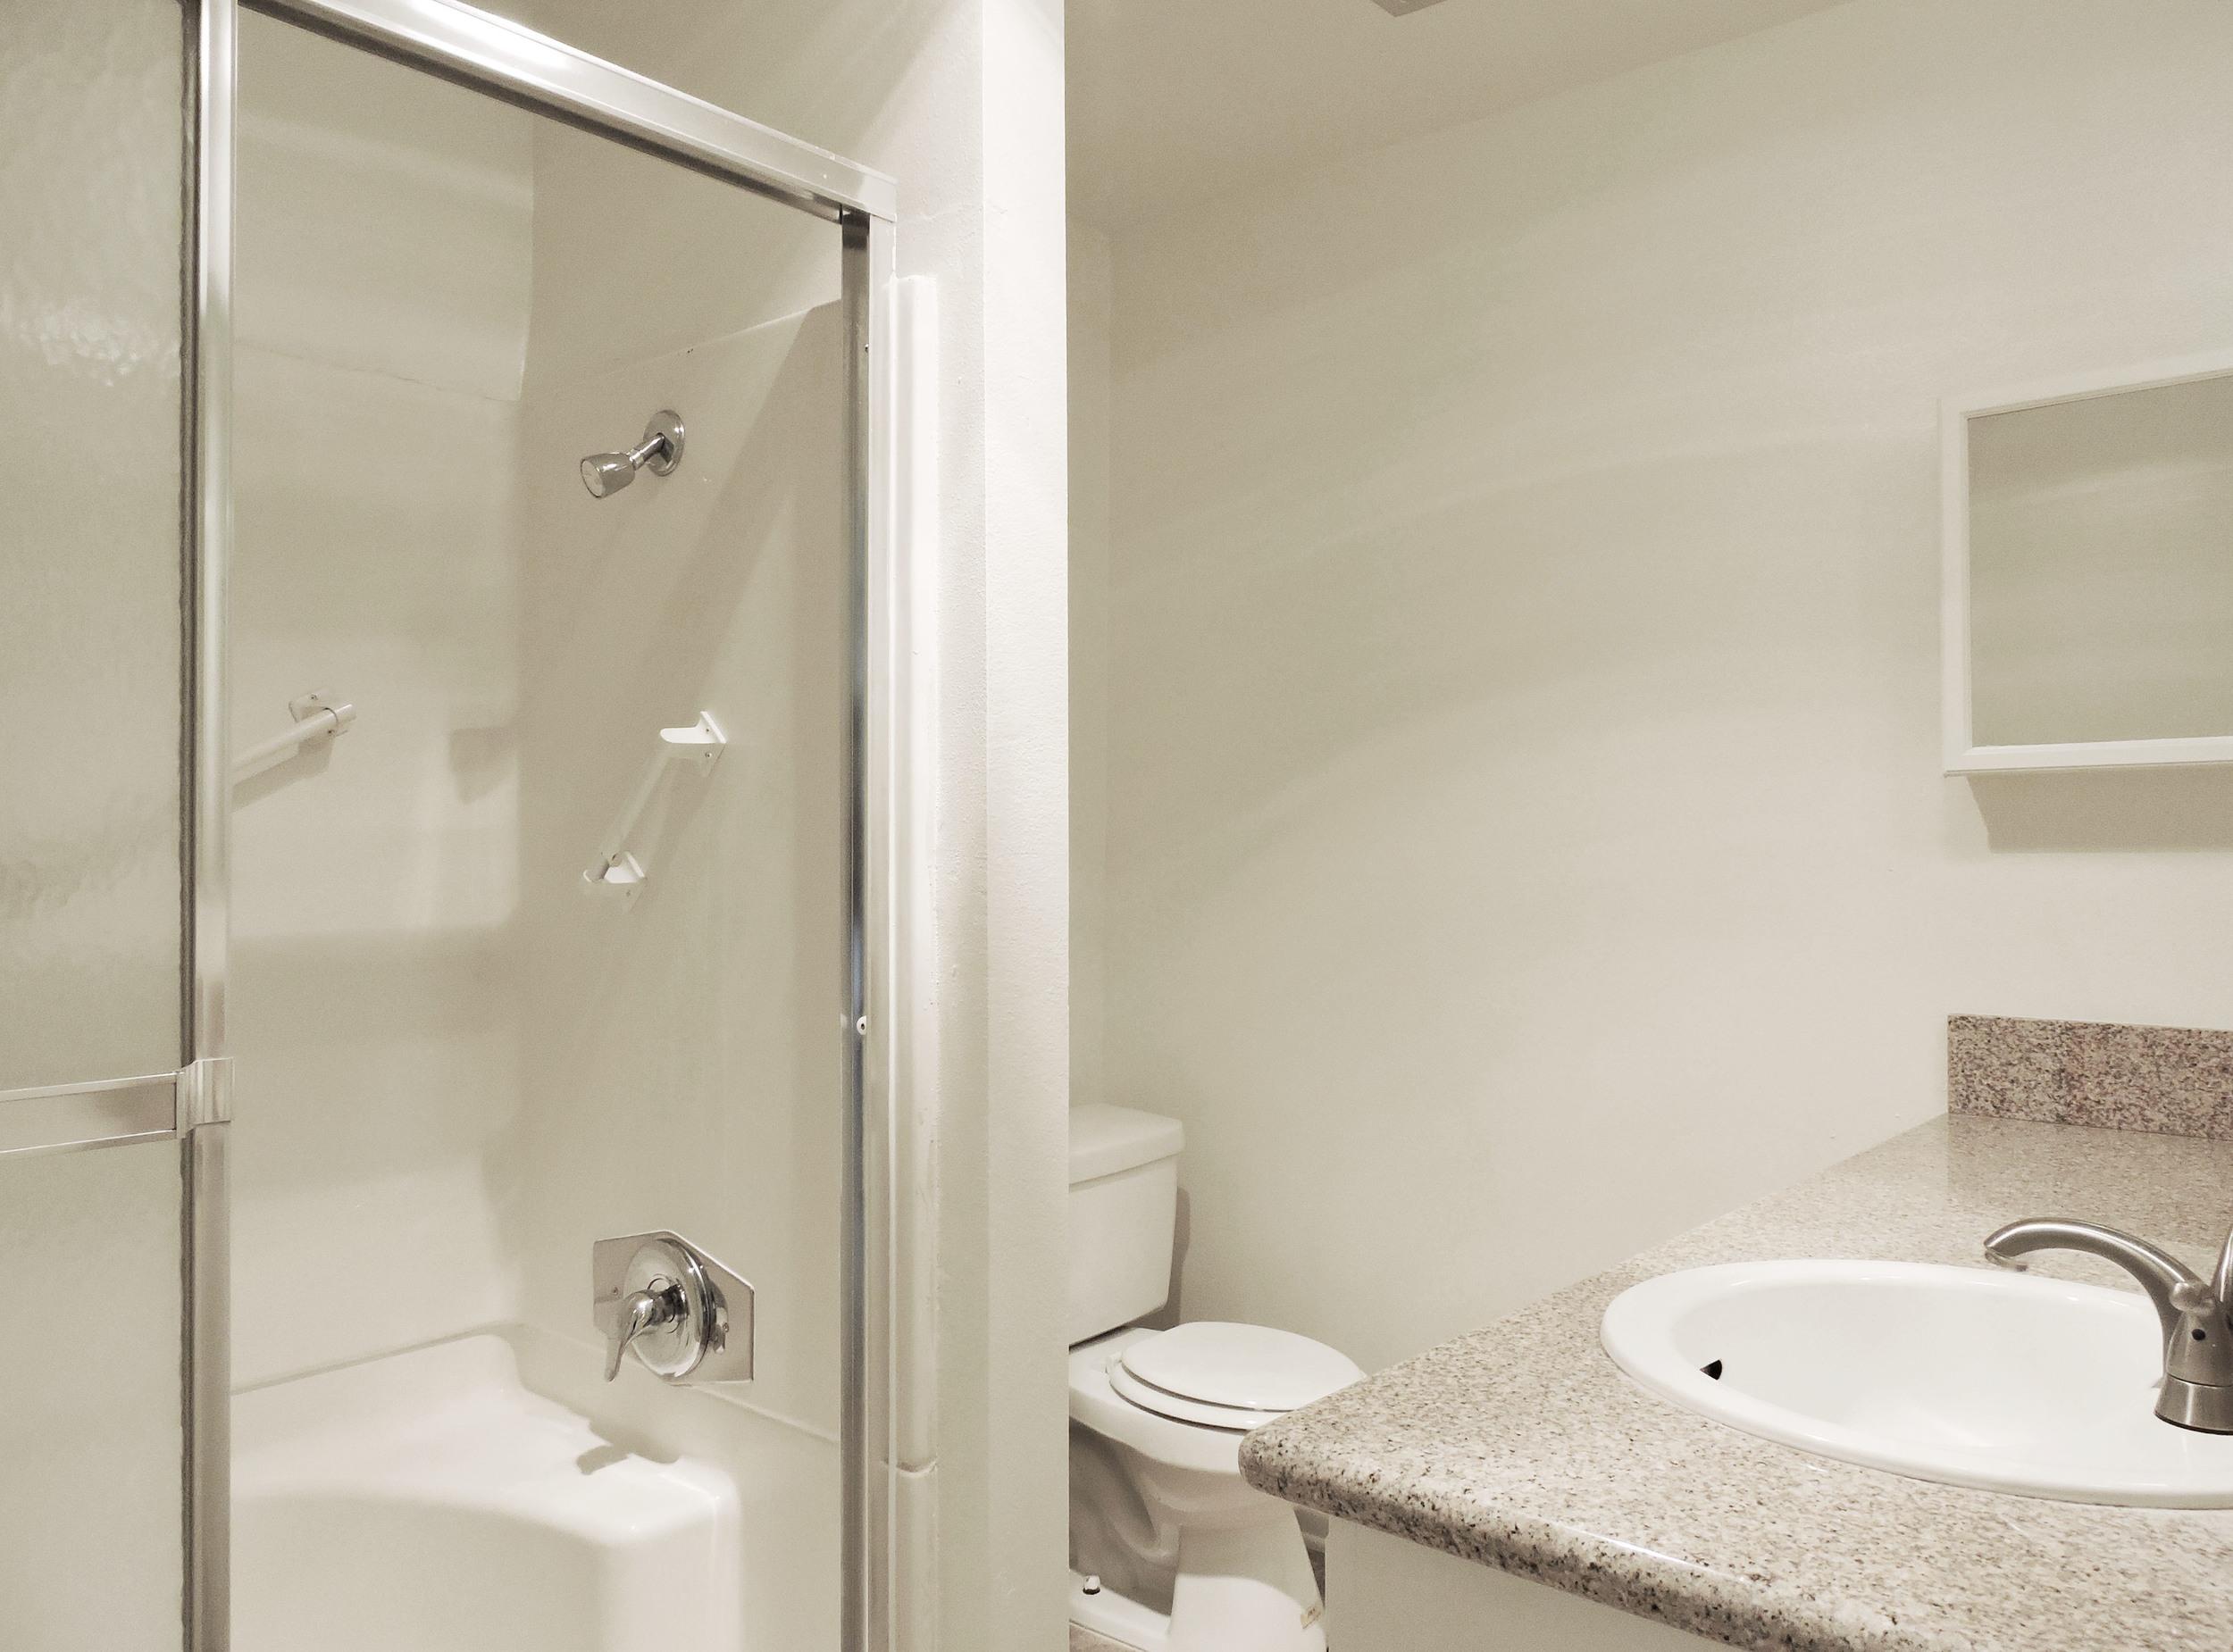 233 bathroom2.jpg